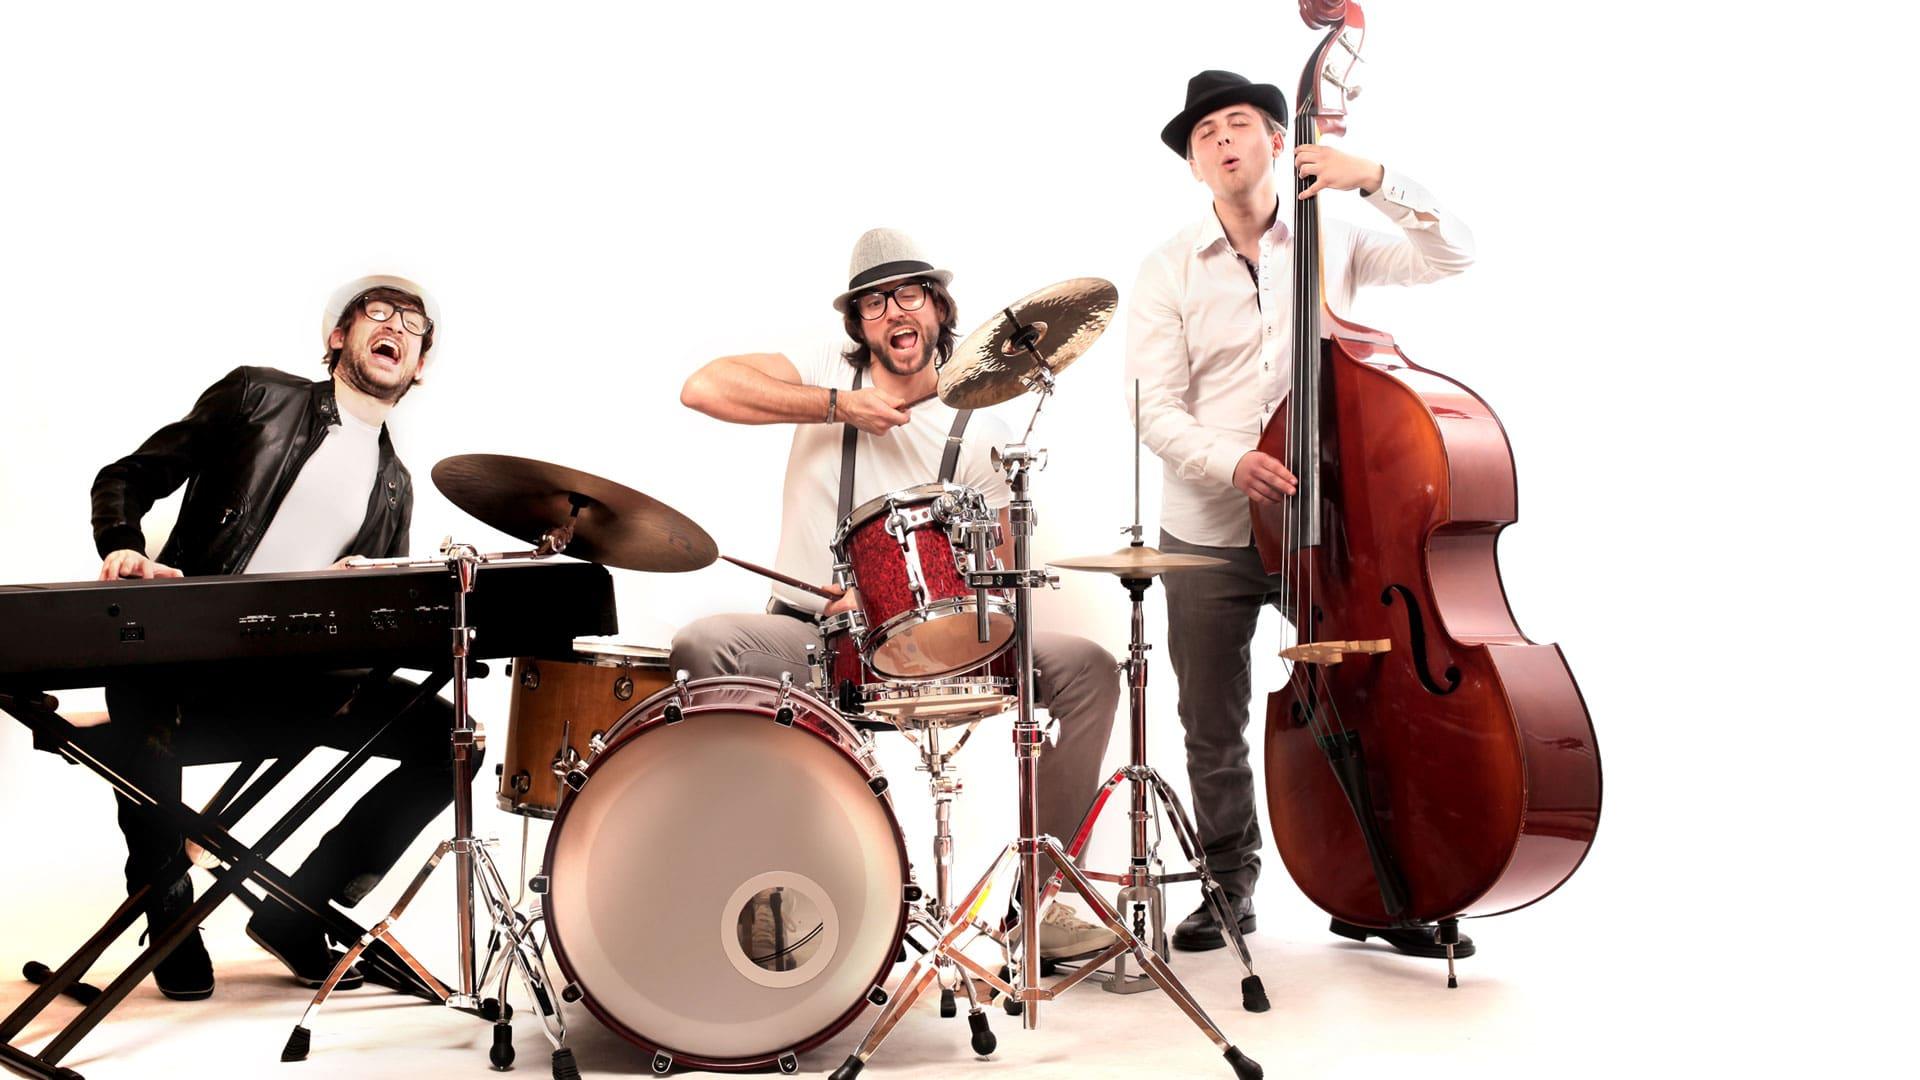 muzički-band.jpg